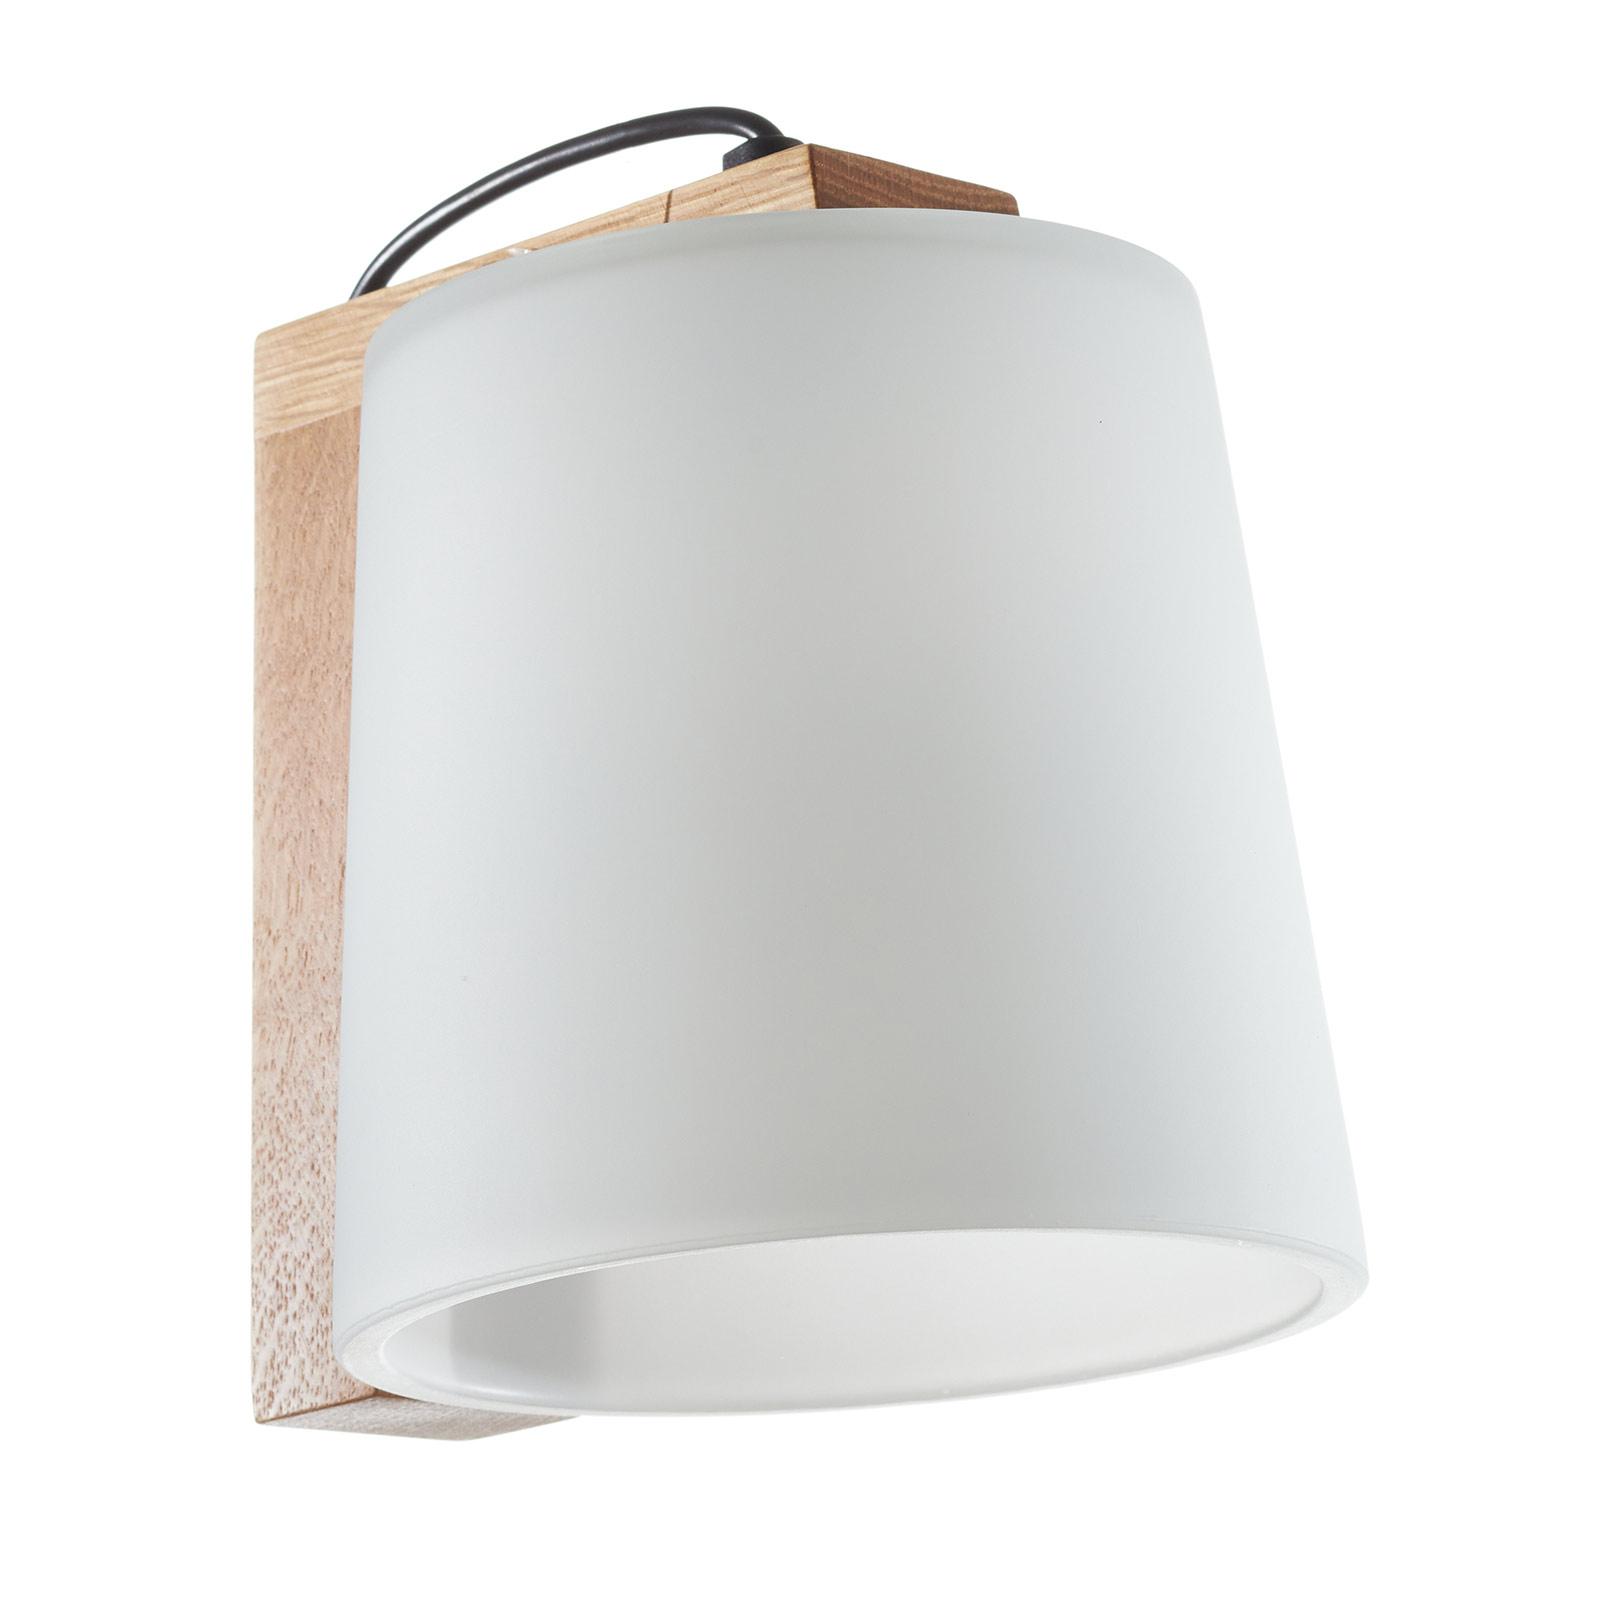 Houten wandlamp Mona